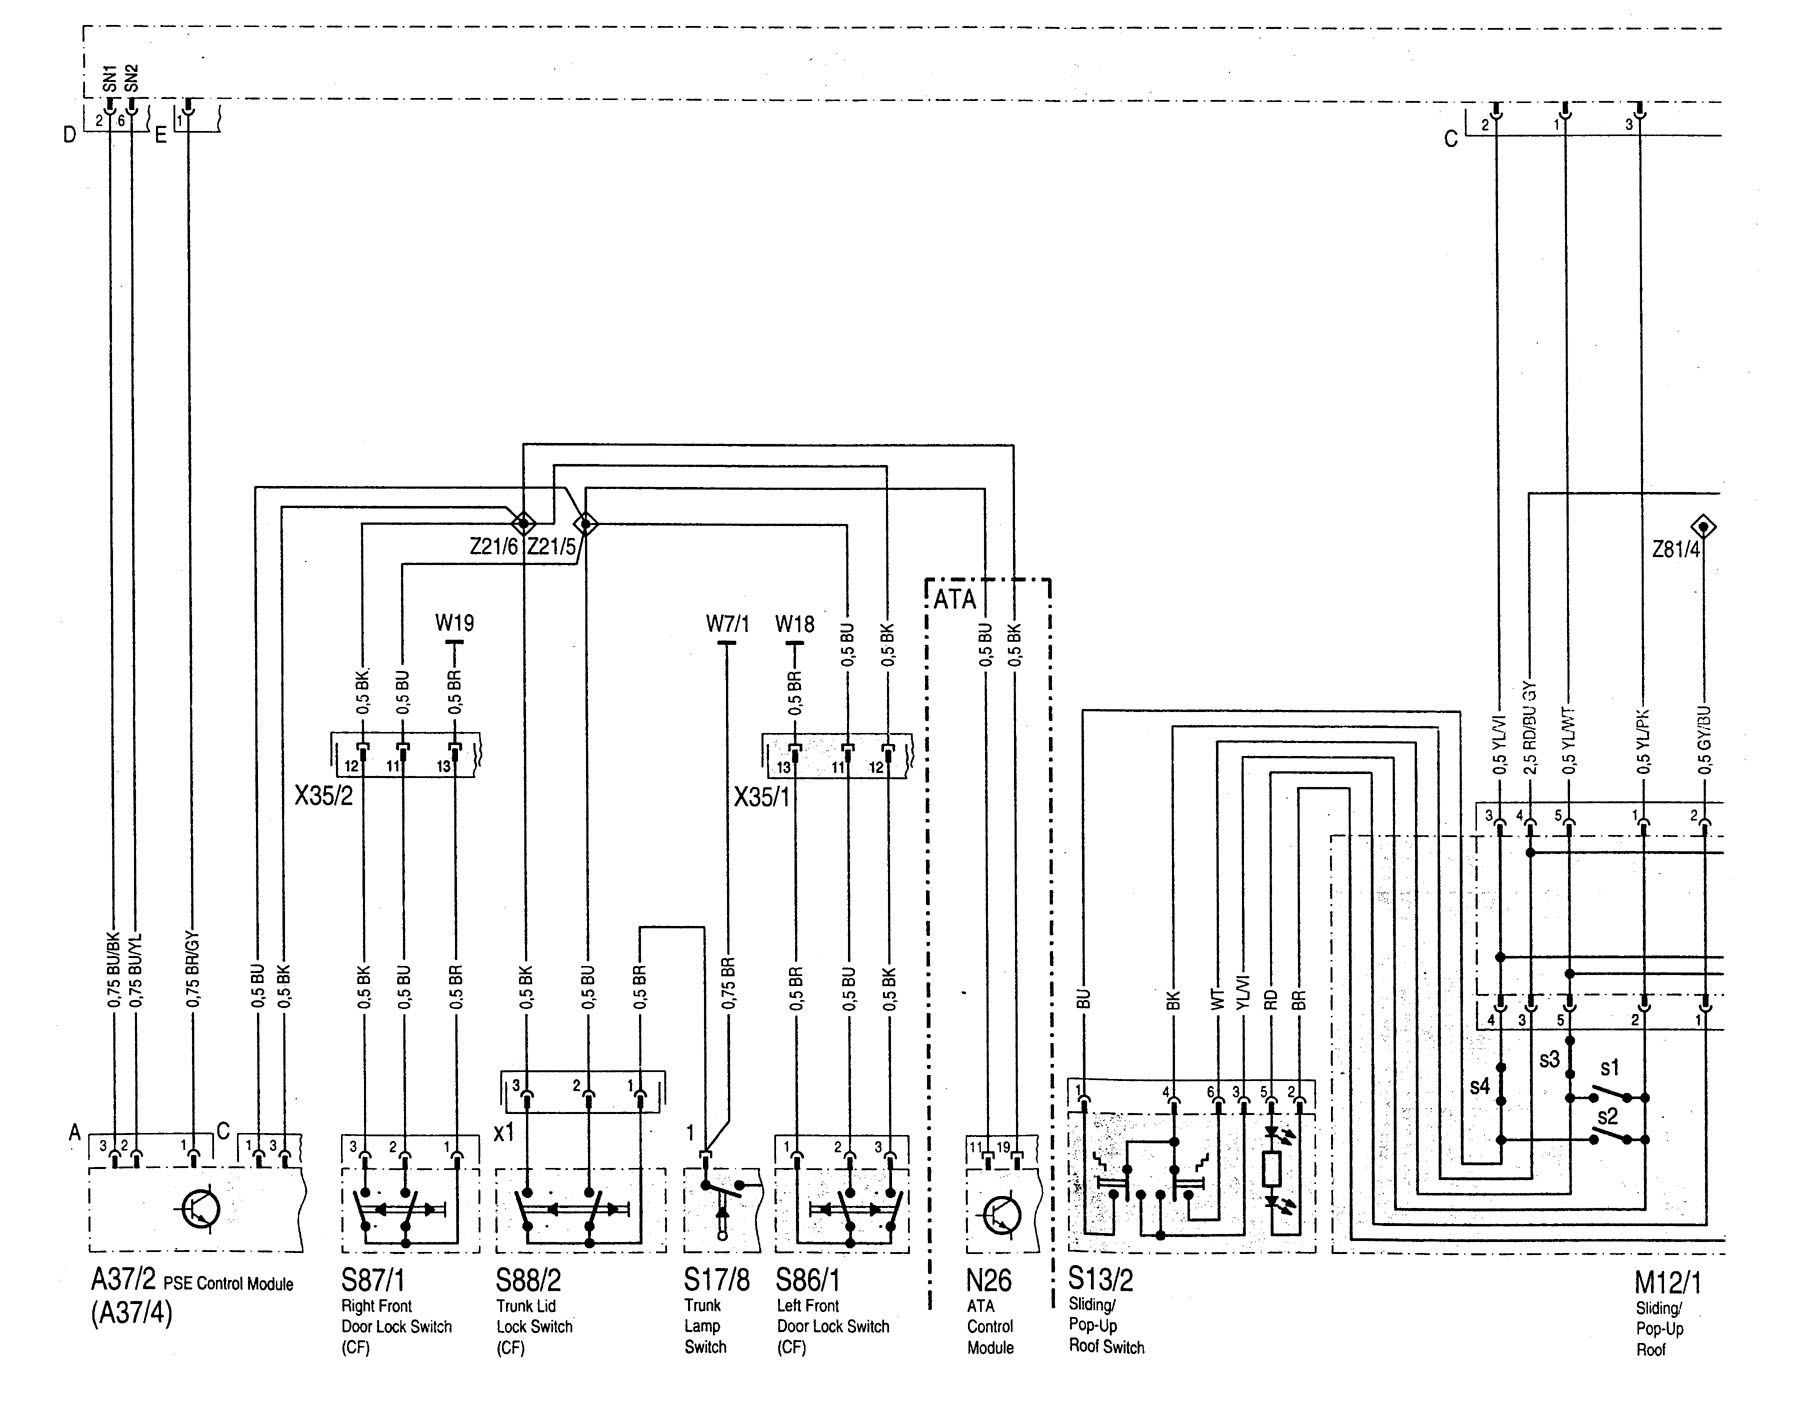 Integra Sunroof Wiring Diagram - Wiring Diagram